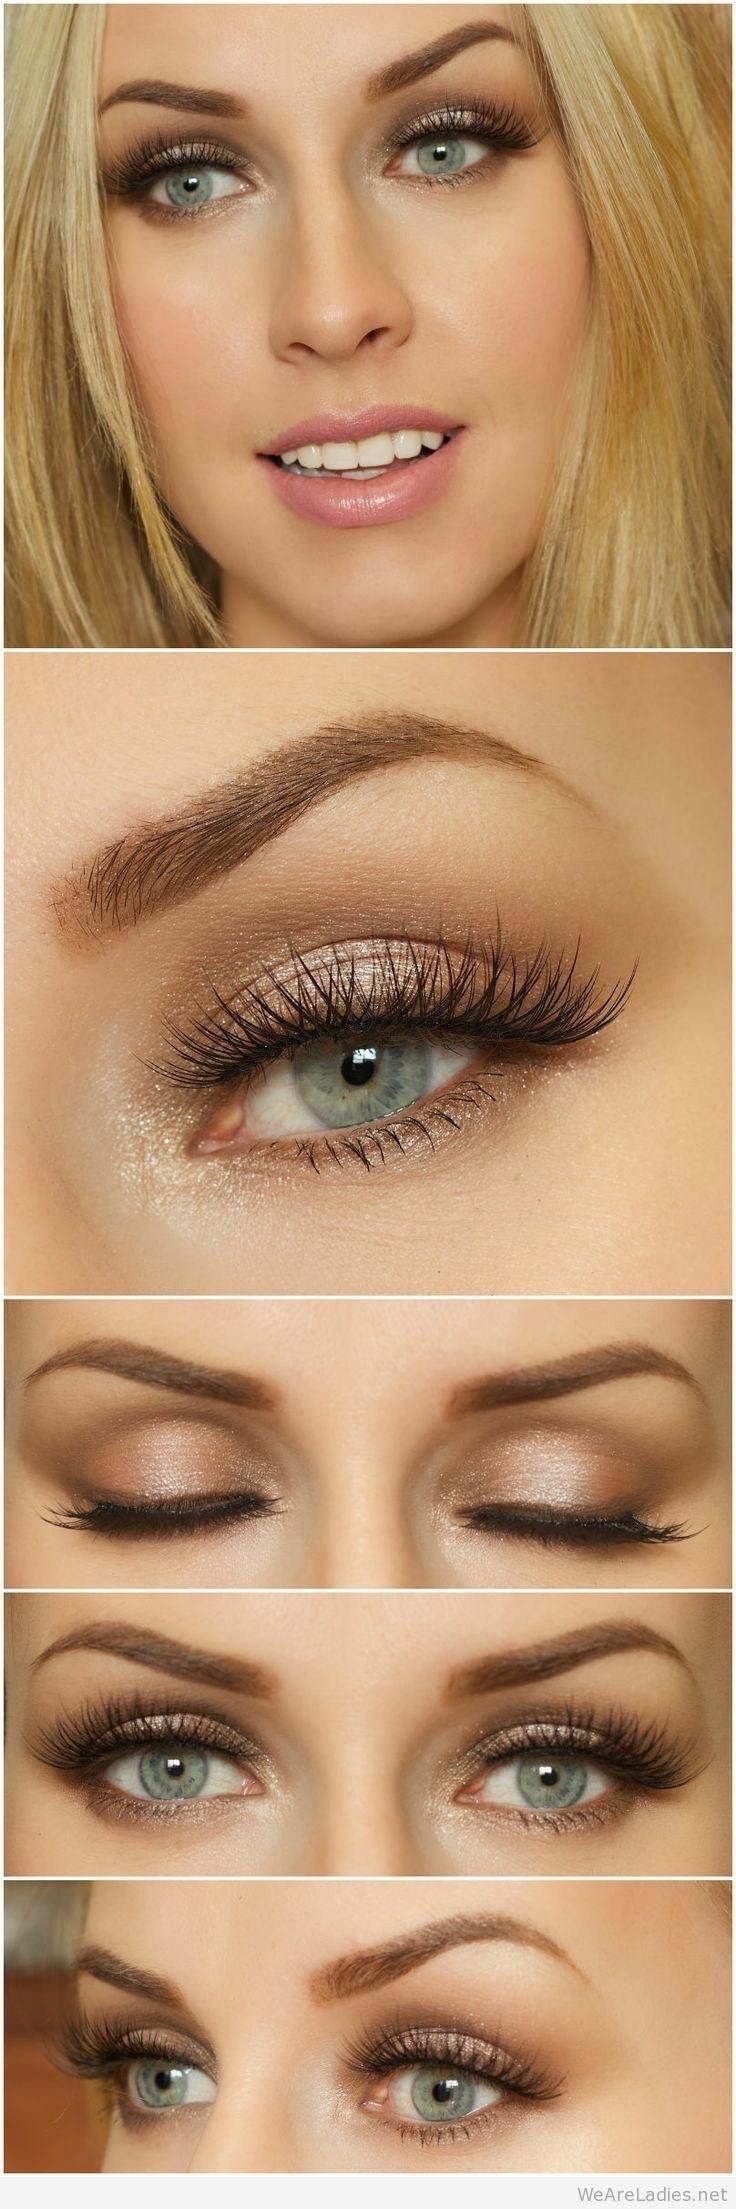 prom makeup blonde hair blue eyes | kakaozzank.co